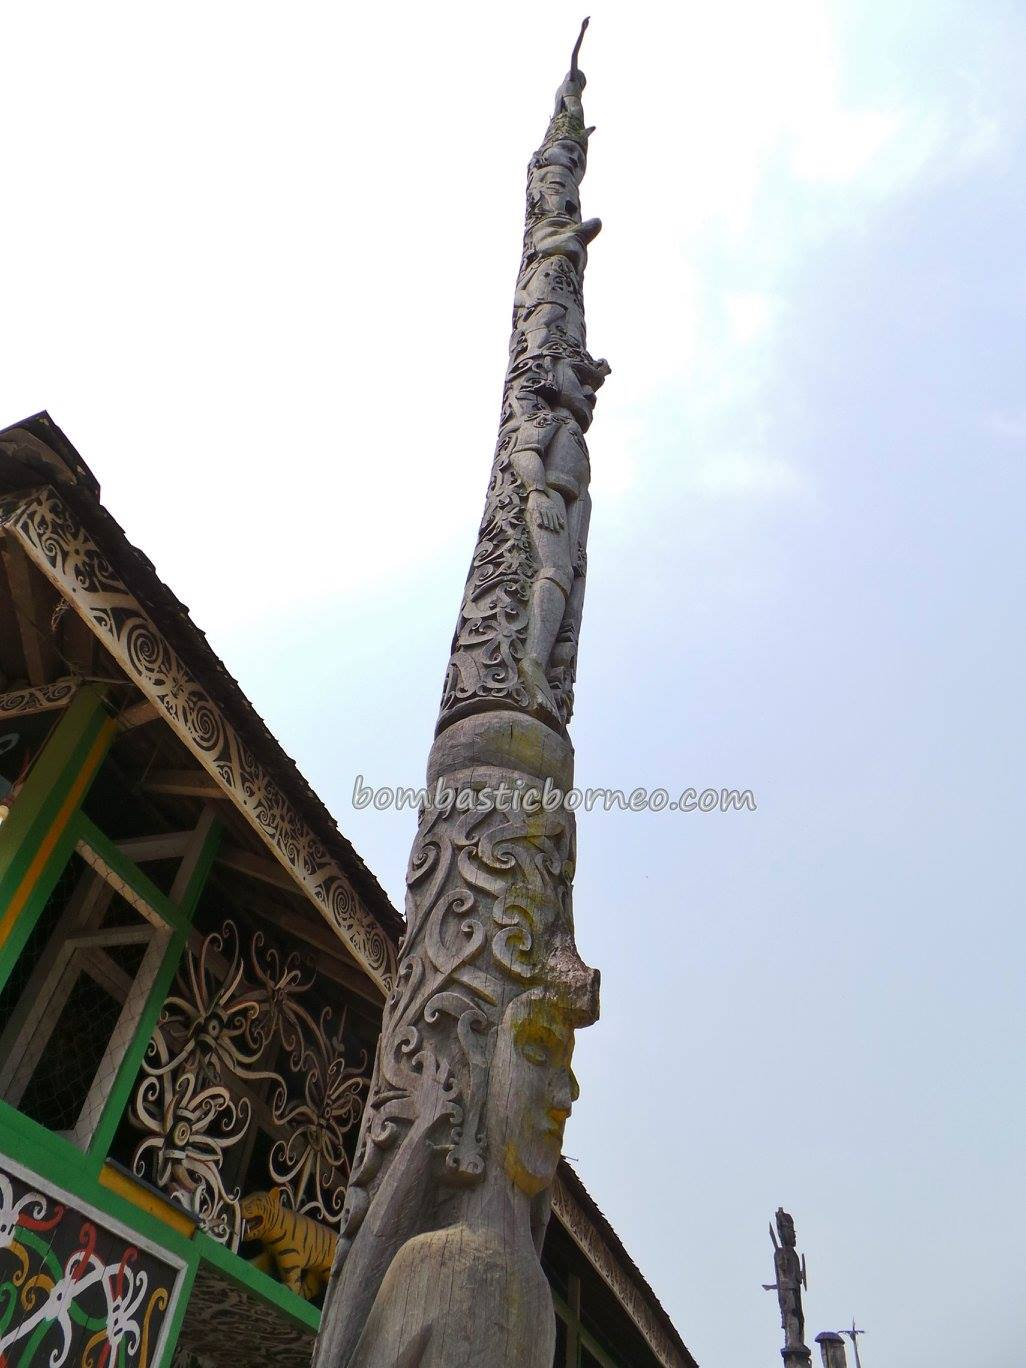 Suku Dayak Kayan Miau Baru East Kalimantan Timur Indonesia